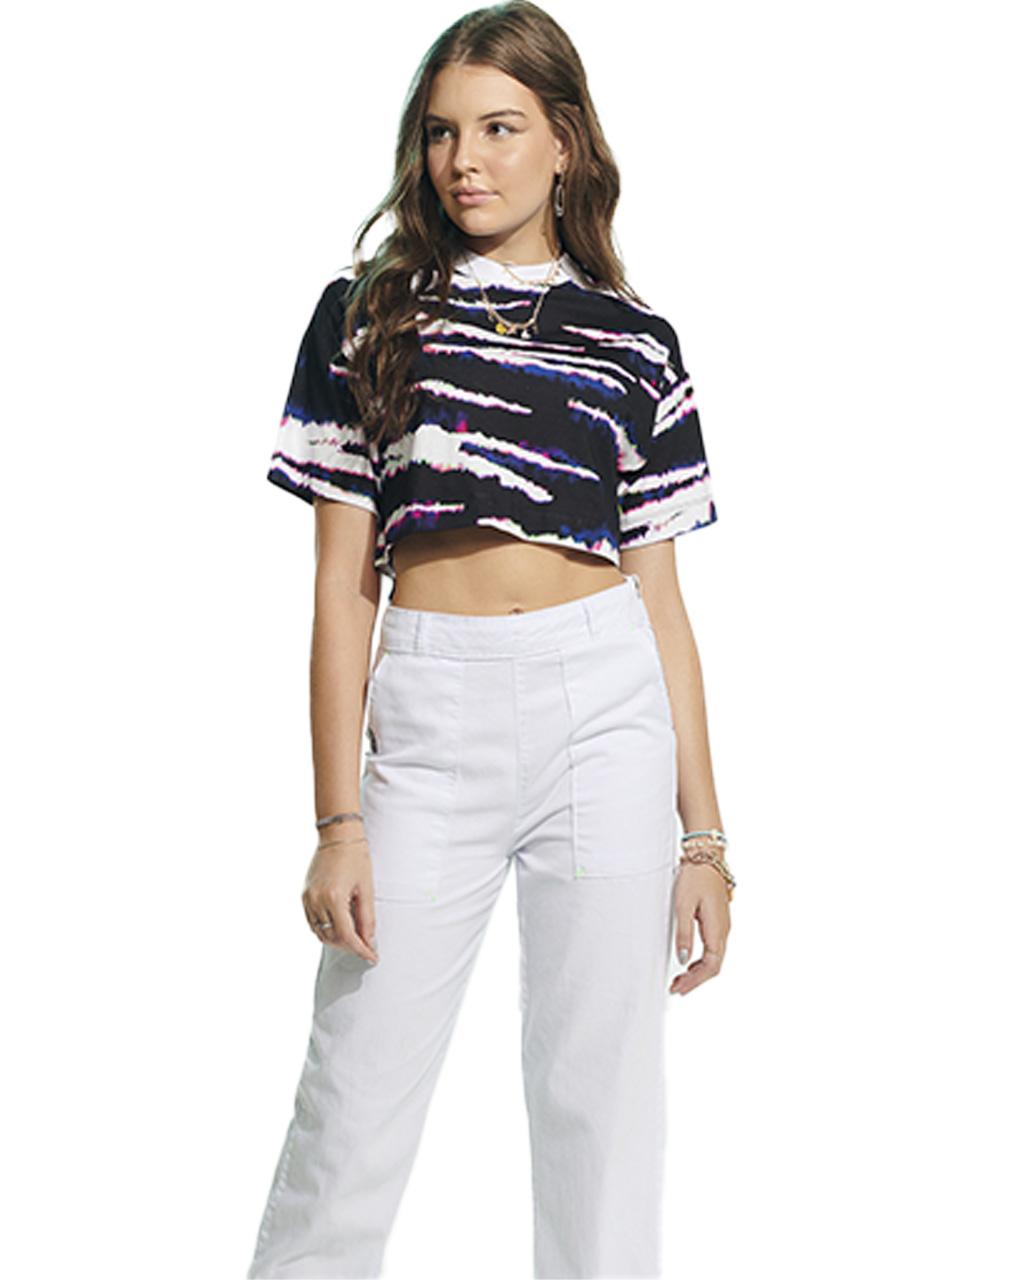 T-Shirt Teen Tie Dye Tiger Authoria